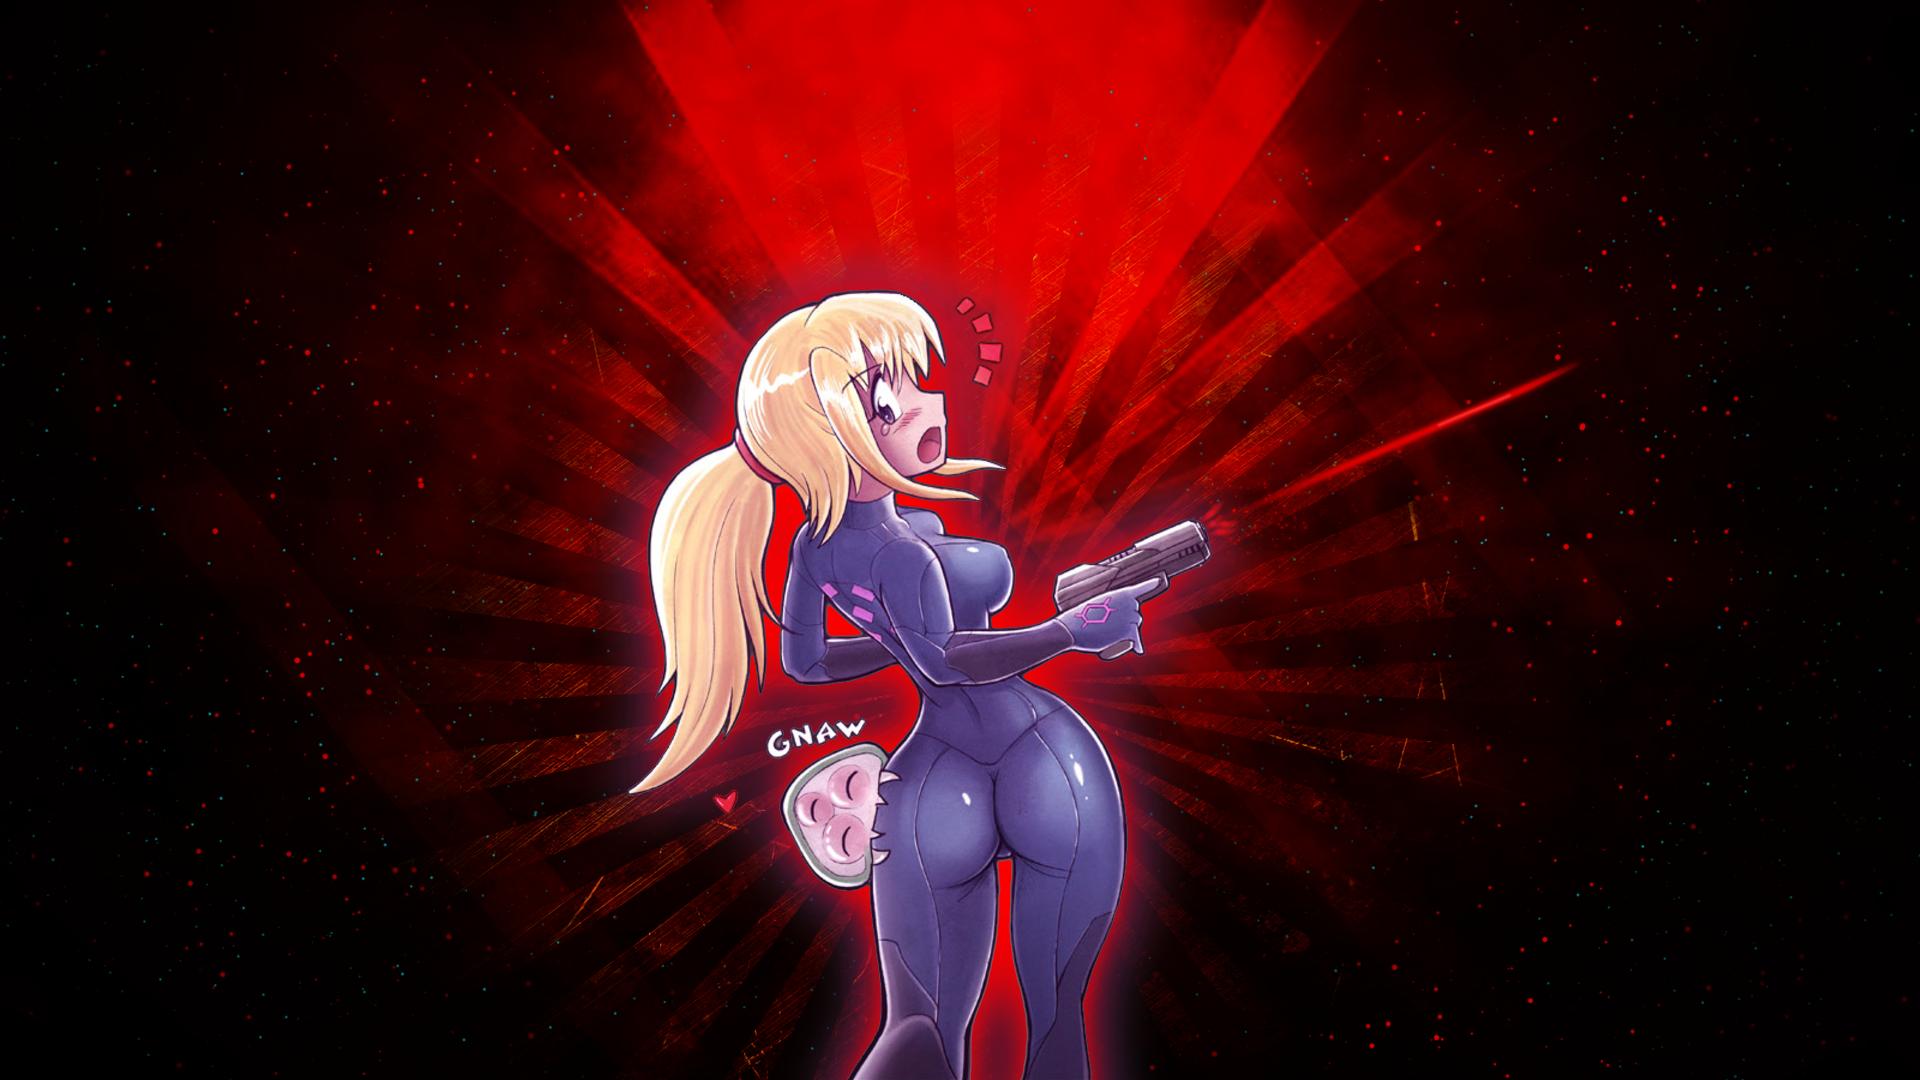 Tags: Anime, Bellhenge, Super Smash Bros., Link, Samus Aran,